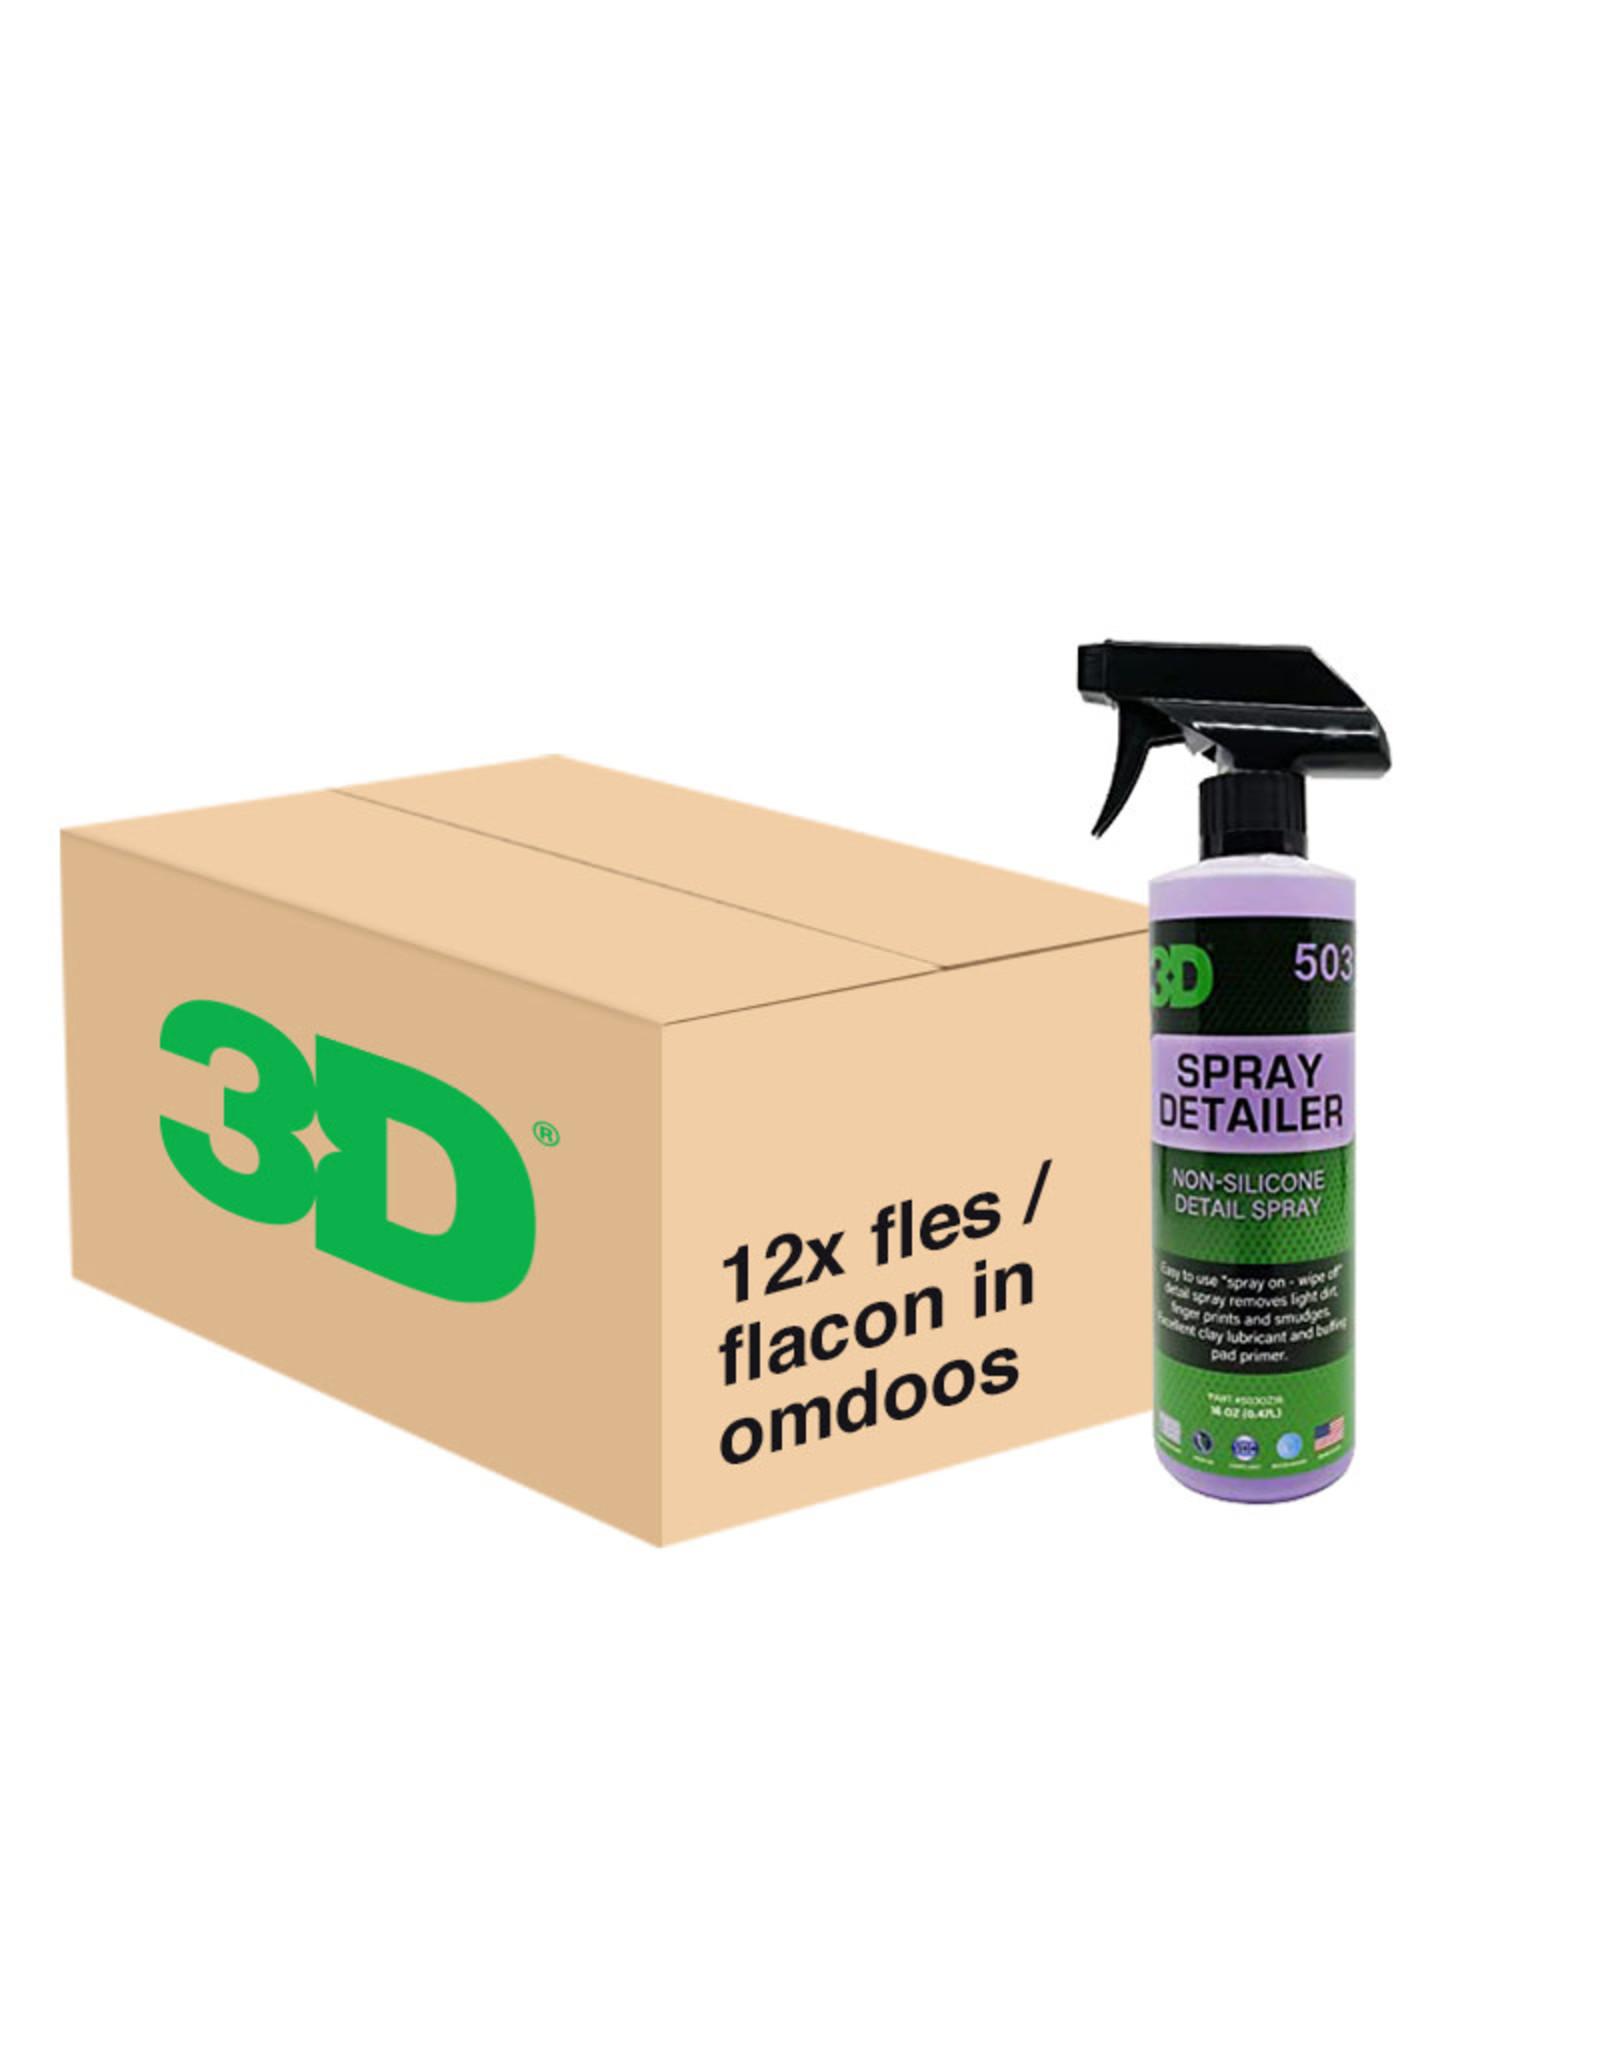 3D PRODUCTS 3D Spray Detailer - 16 oz / 473 ml - 12x Spray Fles - grootverpakking